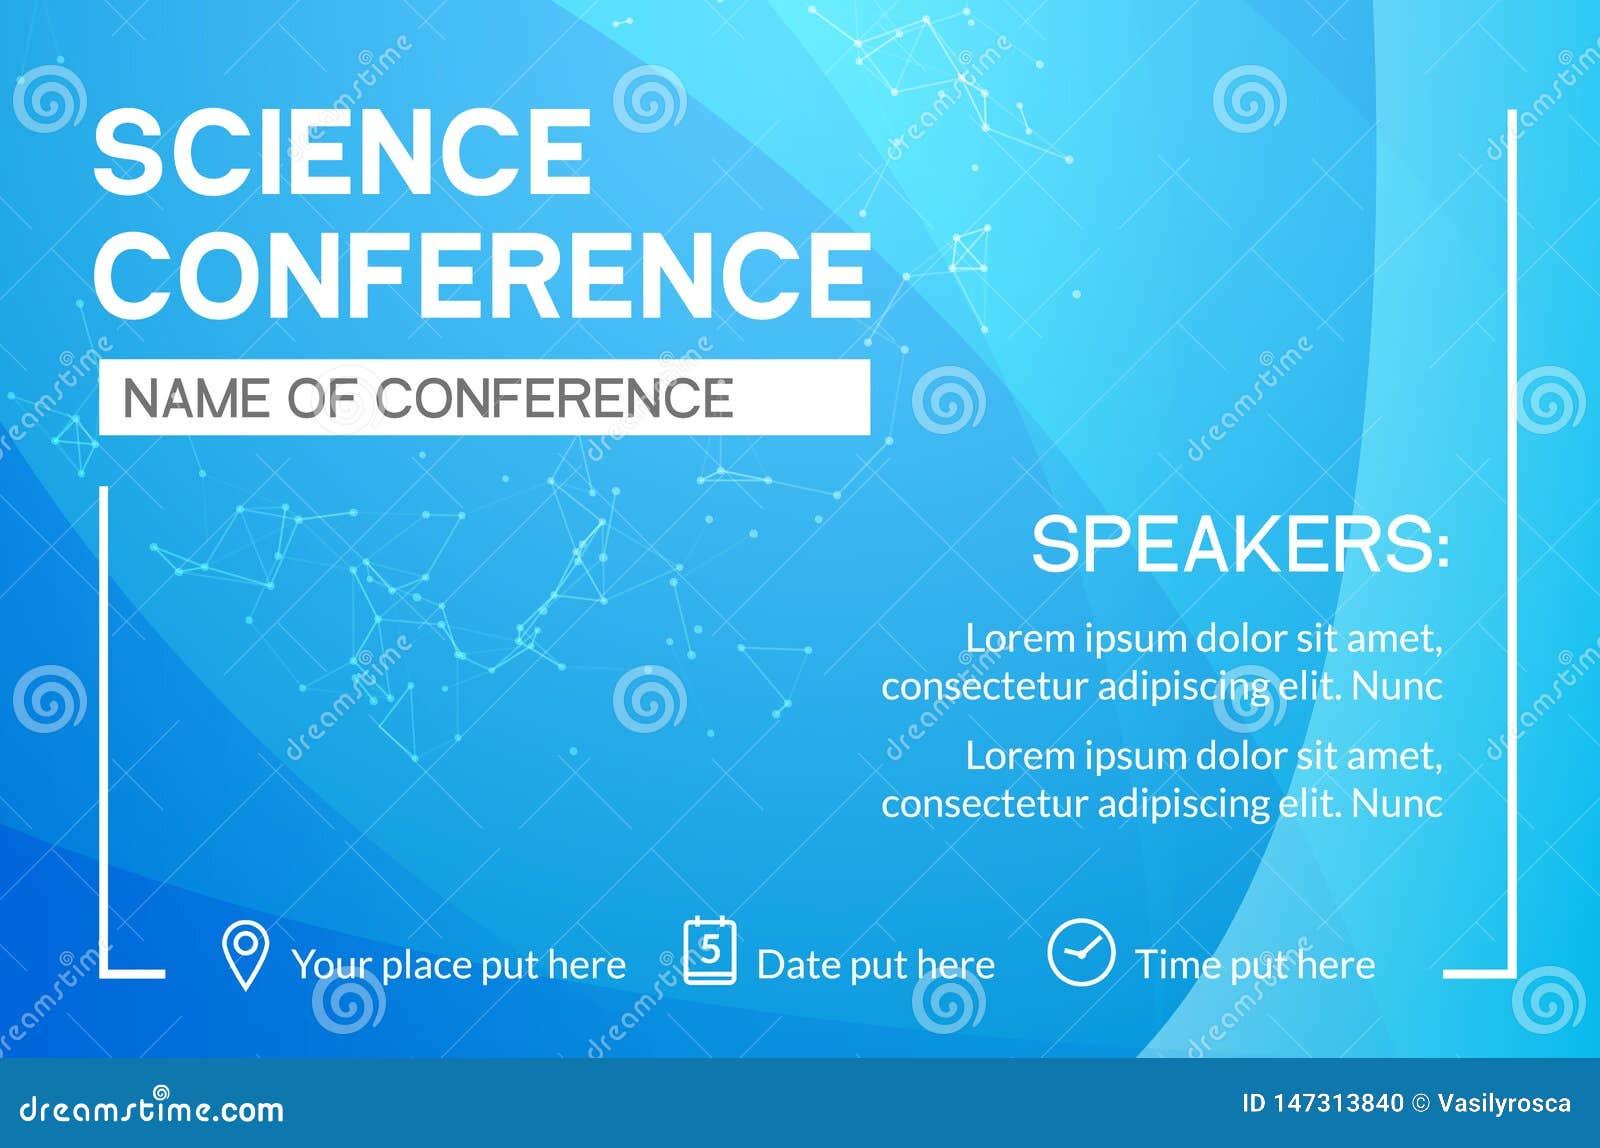 Mall f?r design f?r vetenskapskonferensaff?r M?te f?r advertizing f?r marknadsf?ring f?r vetenskapsbroschyrreklamblad